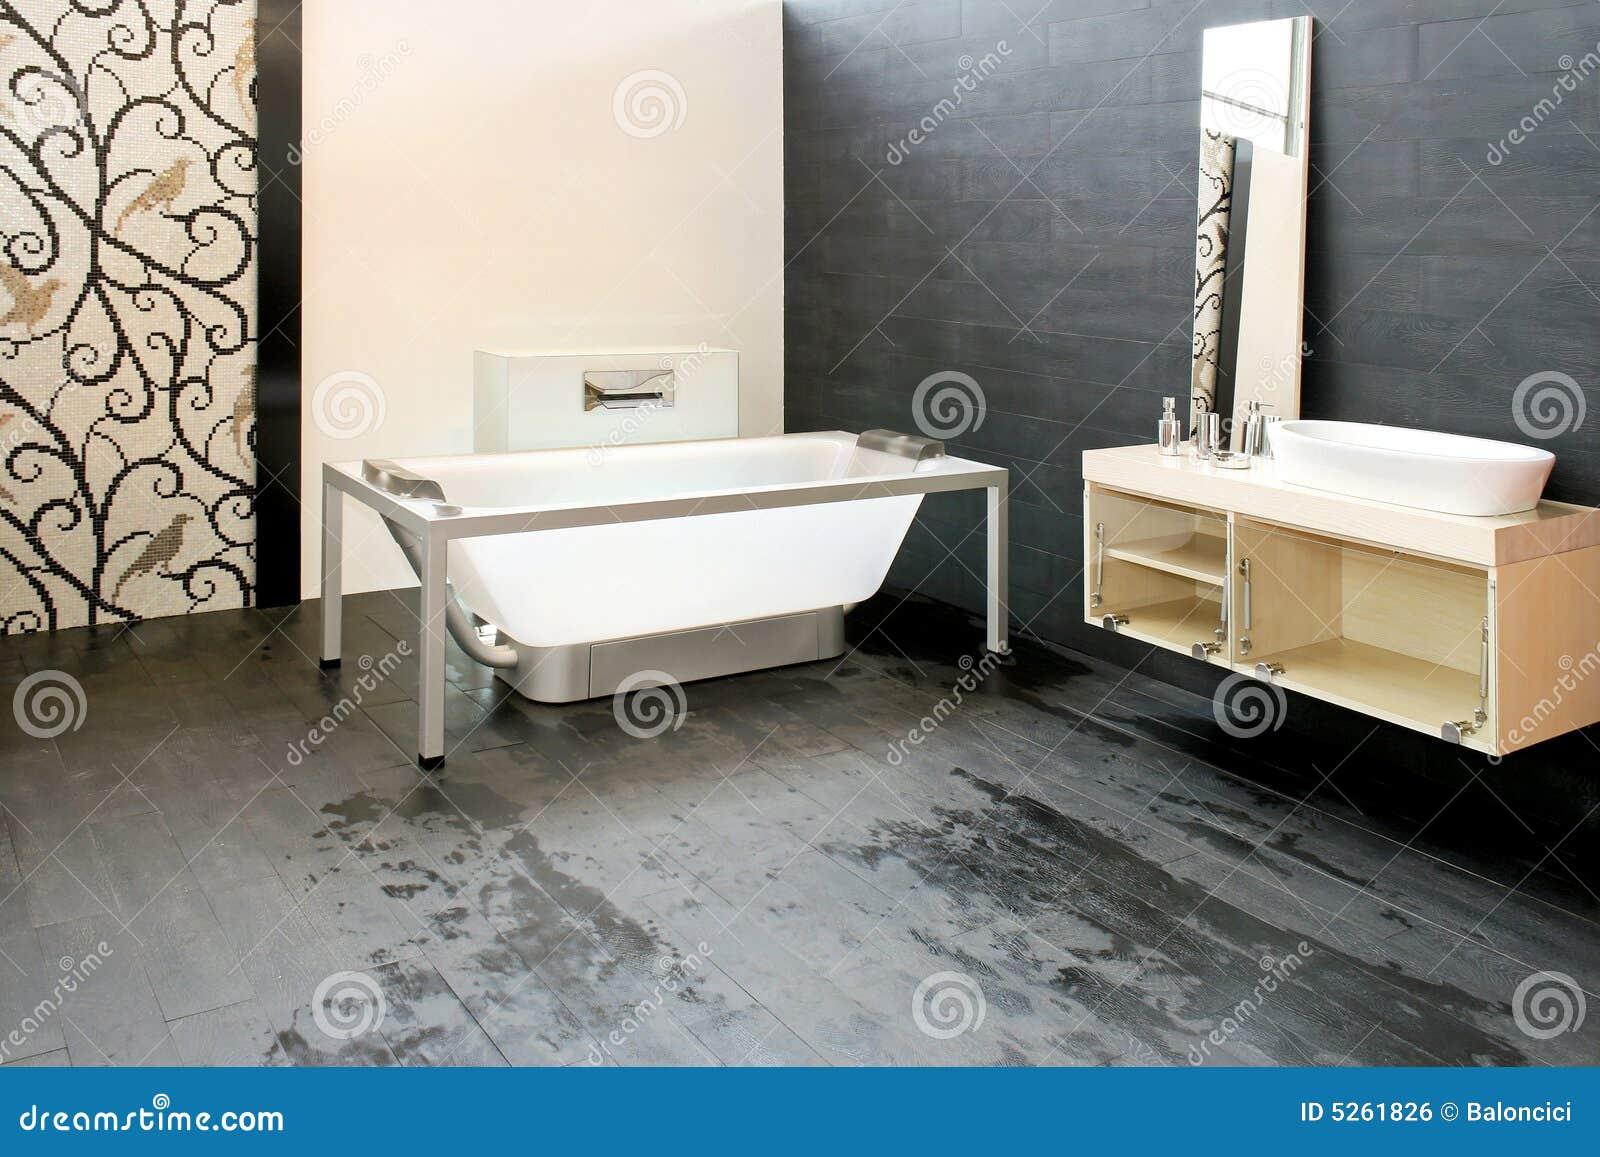 Vasca Da Bagno Rimovibile : Vasca da bagno a scomparsa perfect penisola a scomparsa vasca da